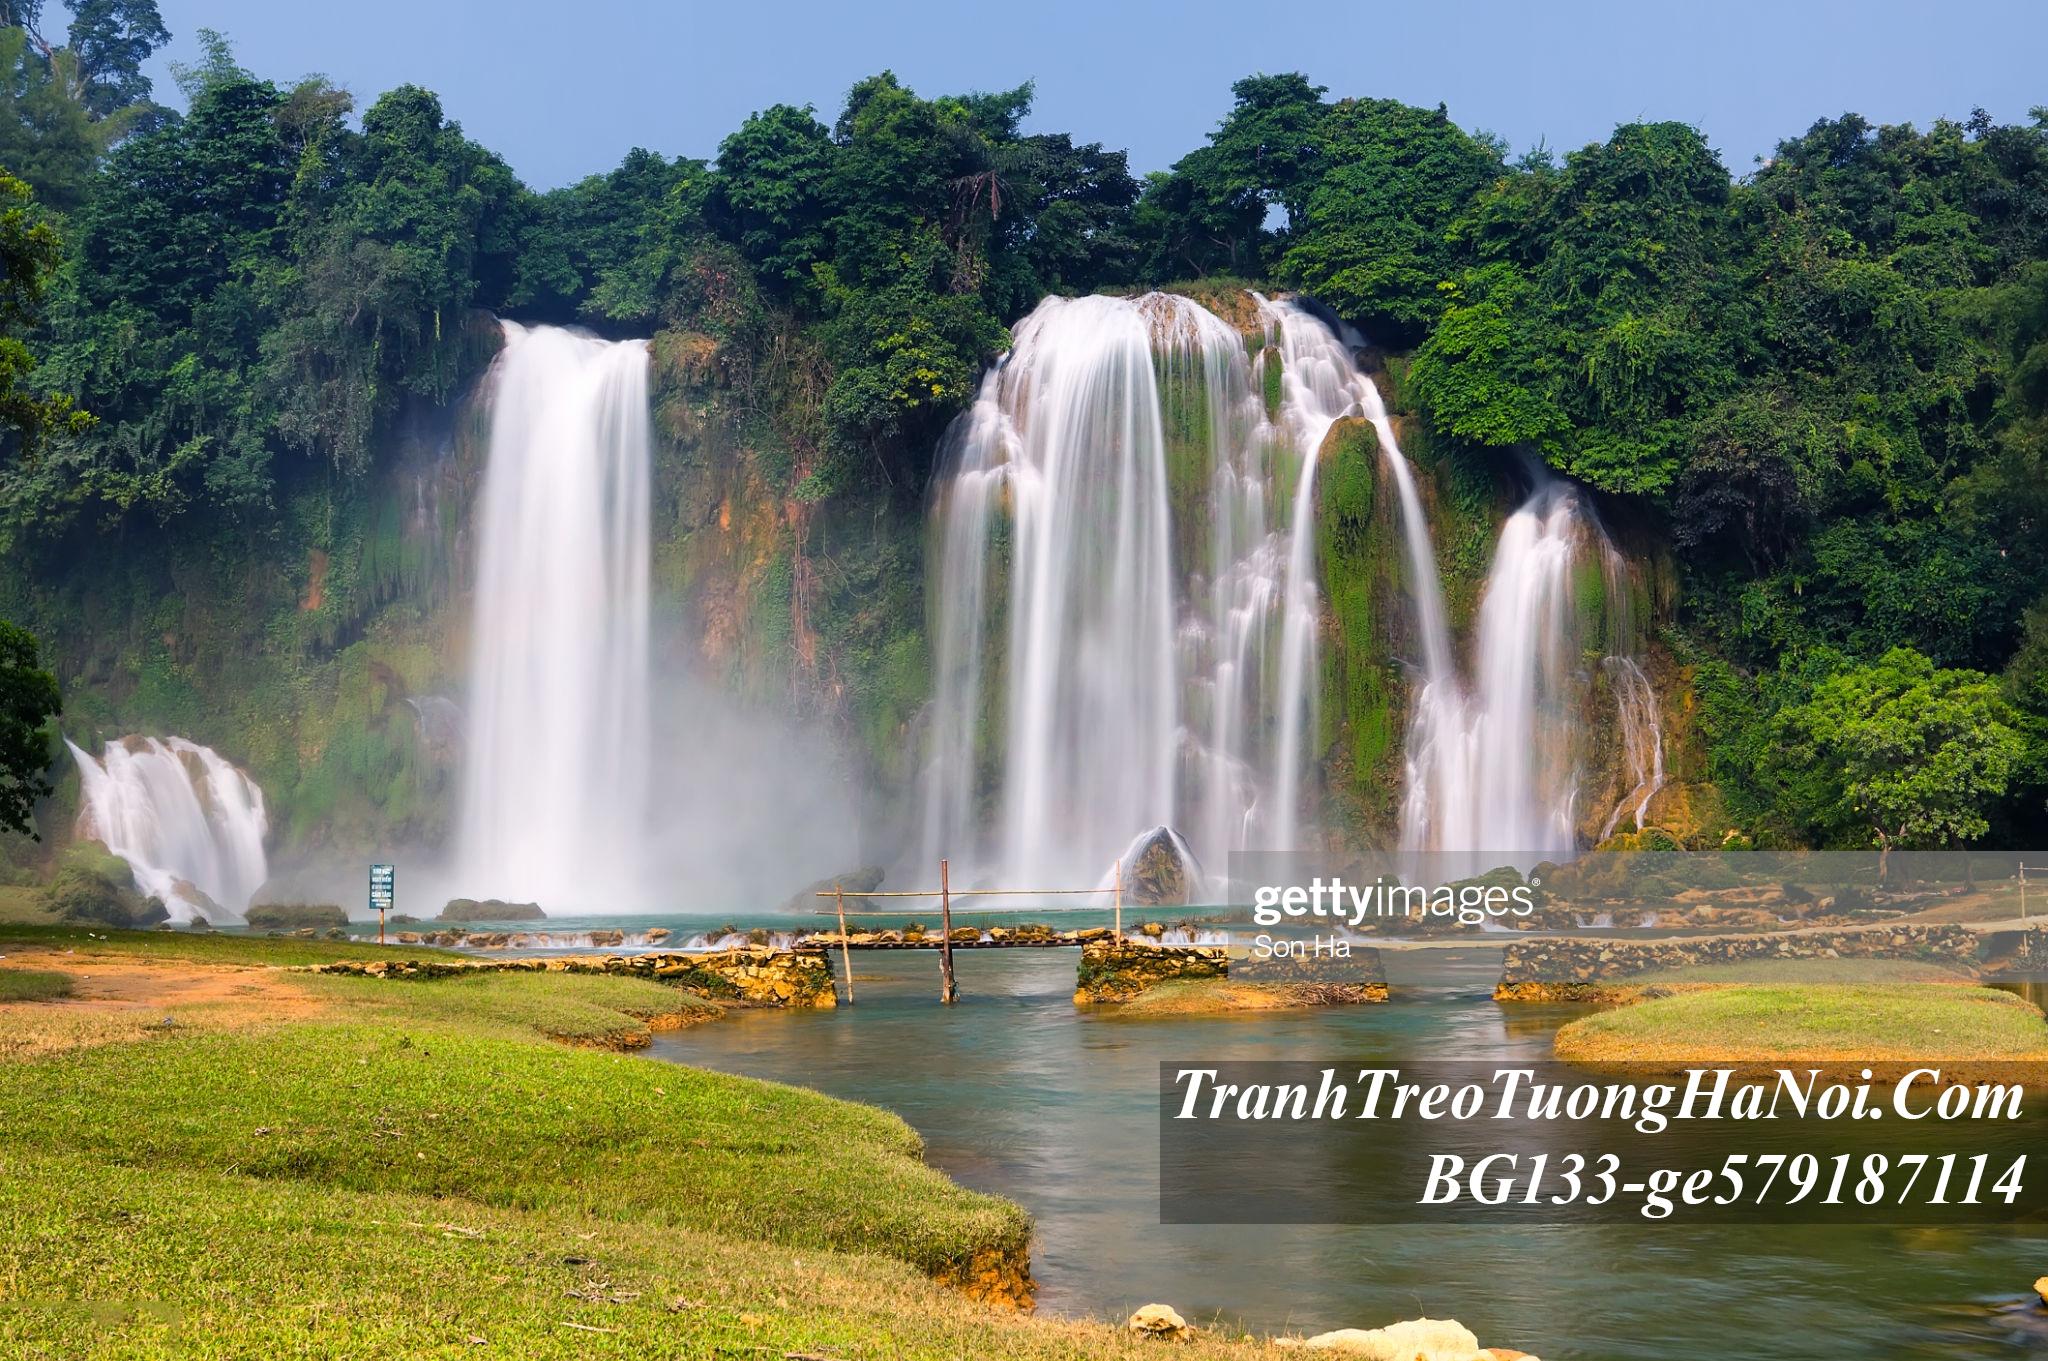 Phong canh dep thac nuoc ban gioc BG133-ge579187114